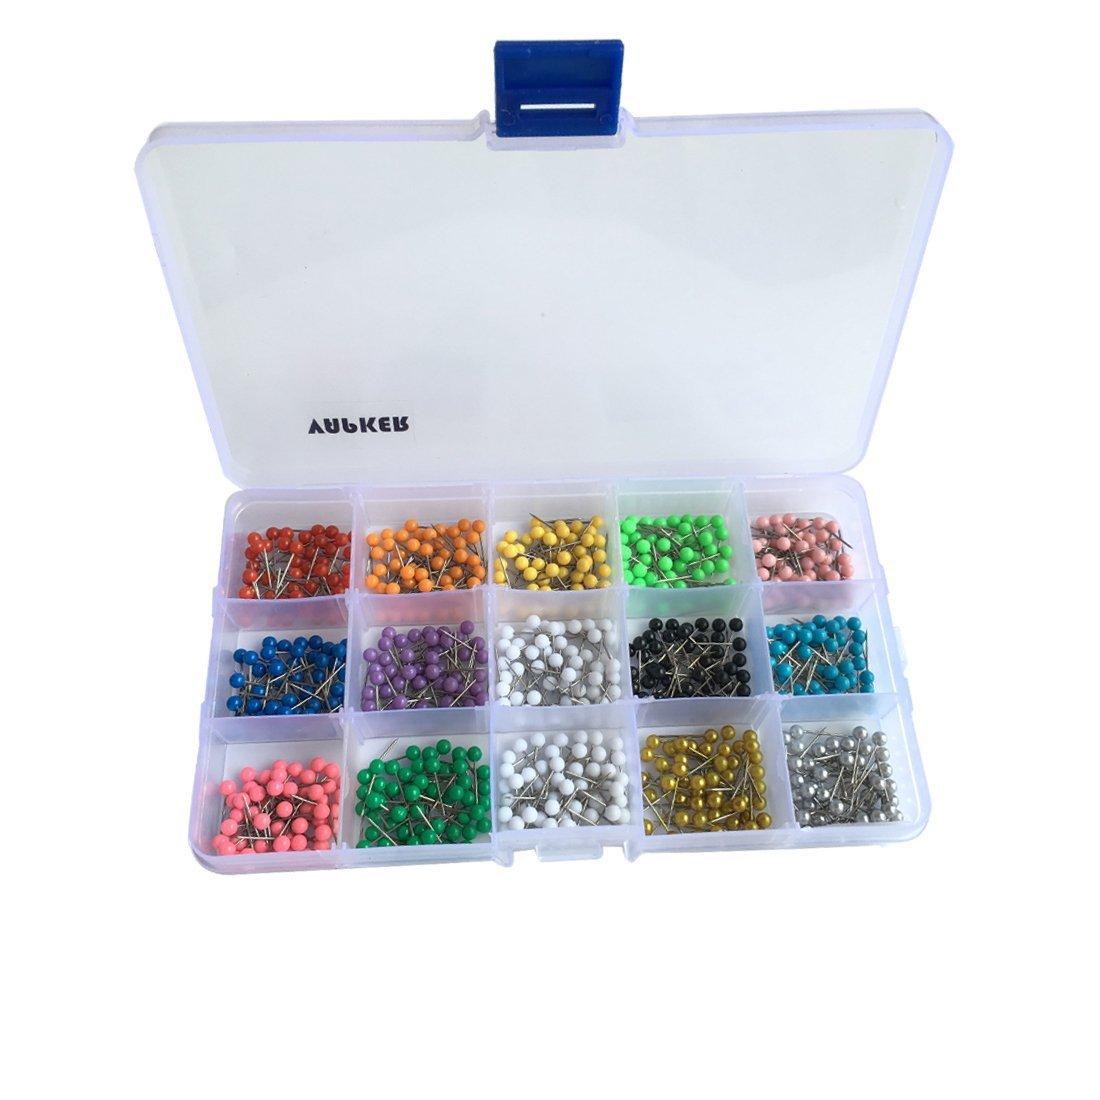 Vapker 750pz colori assortiti tonda 14Map Tacks 1/20, 3cm puntine con mappa 70926